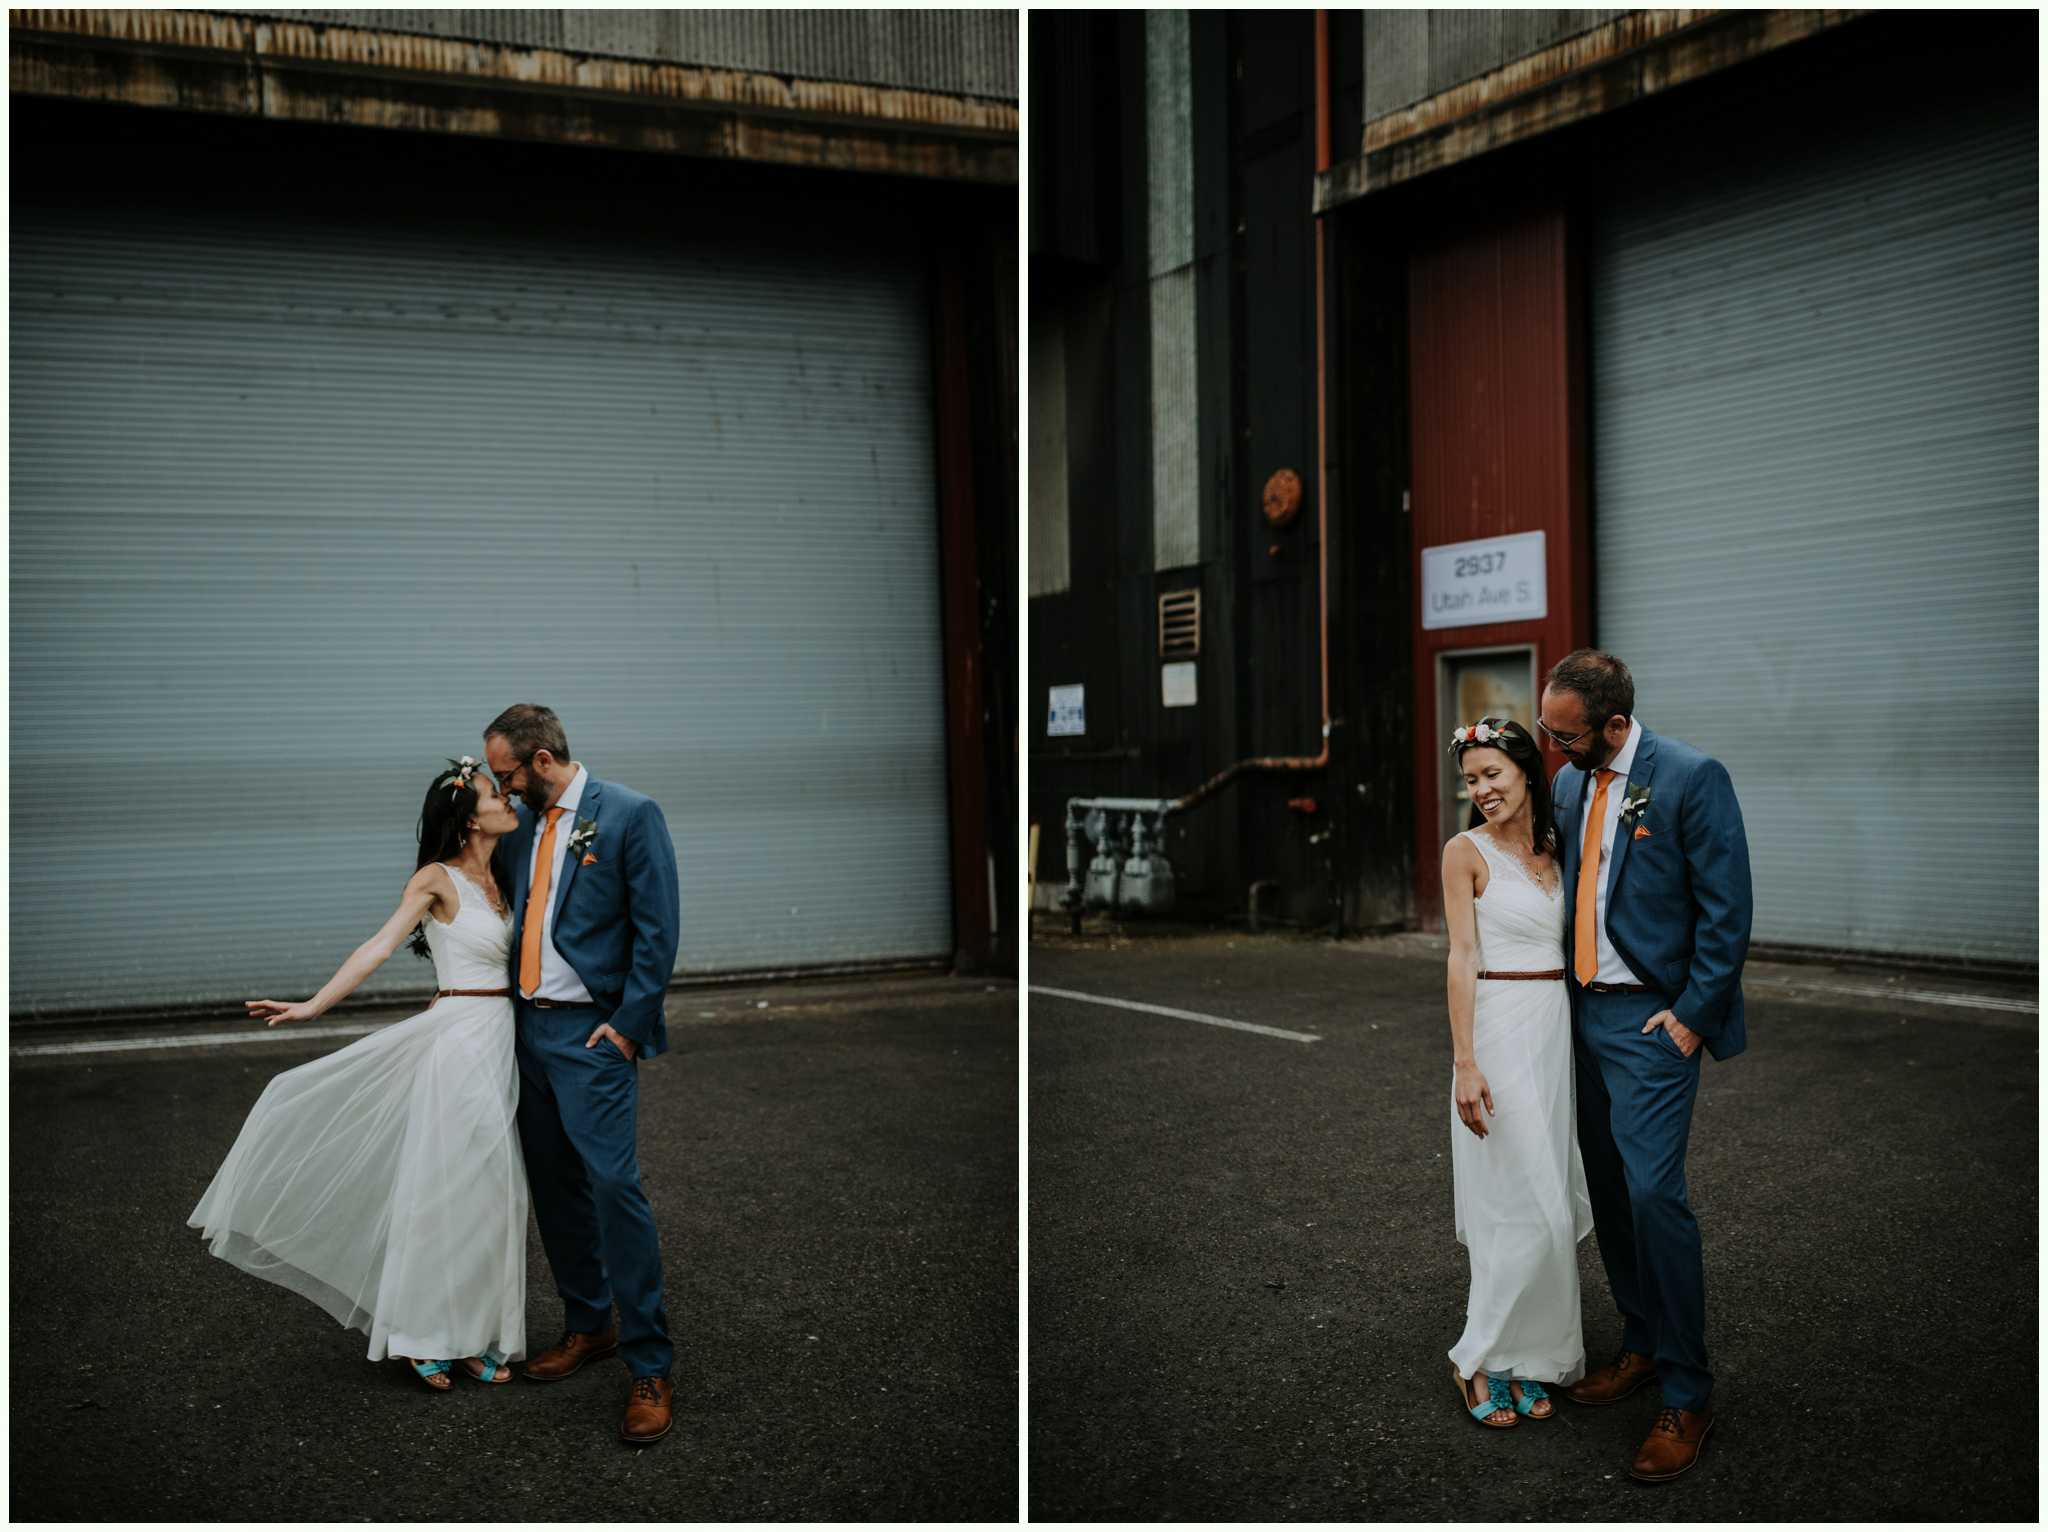 within-sodo-june-wedding-seattle-photographer-caitlyn-nikula-90.jpg